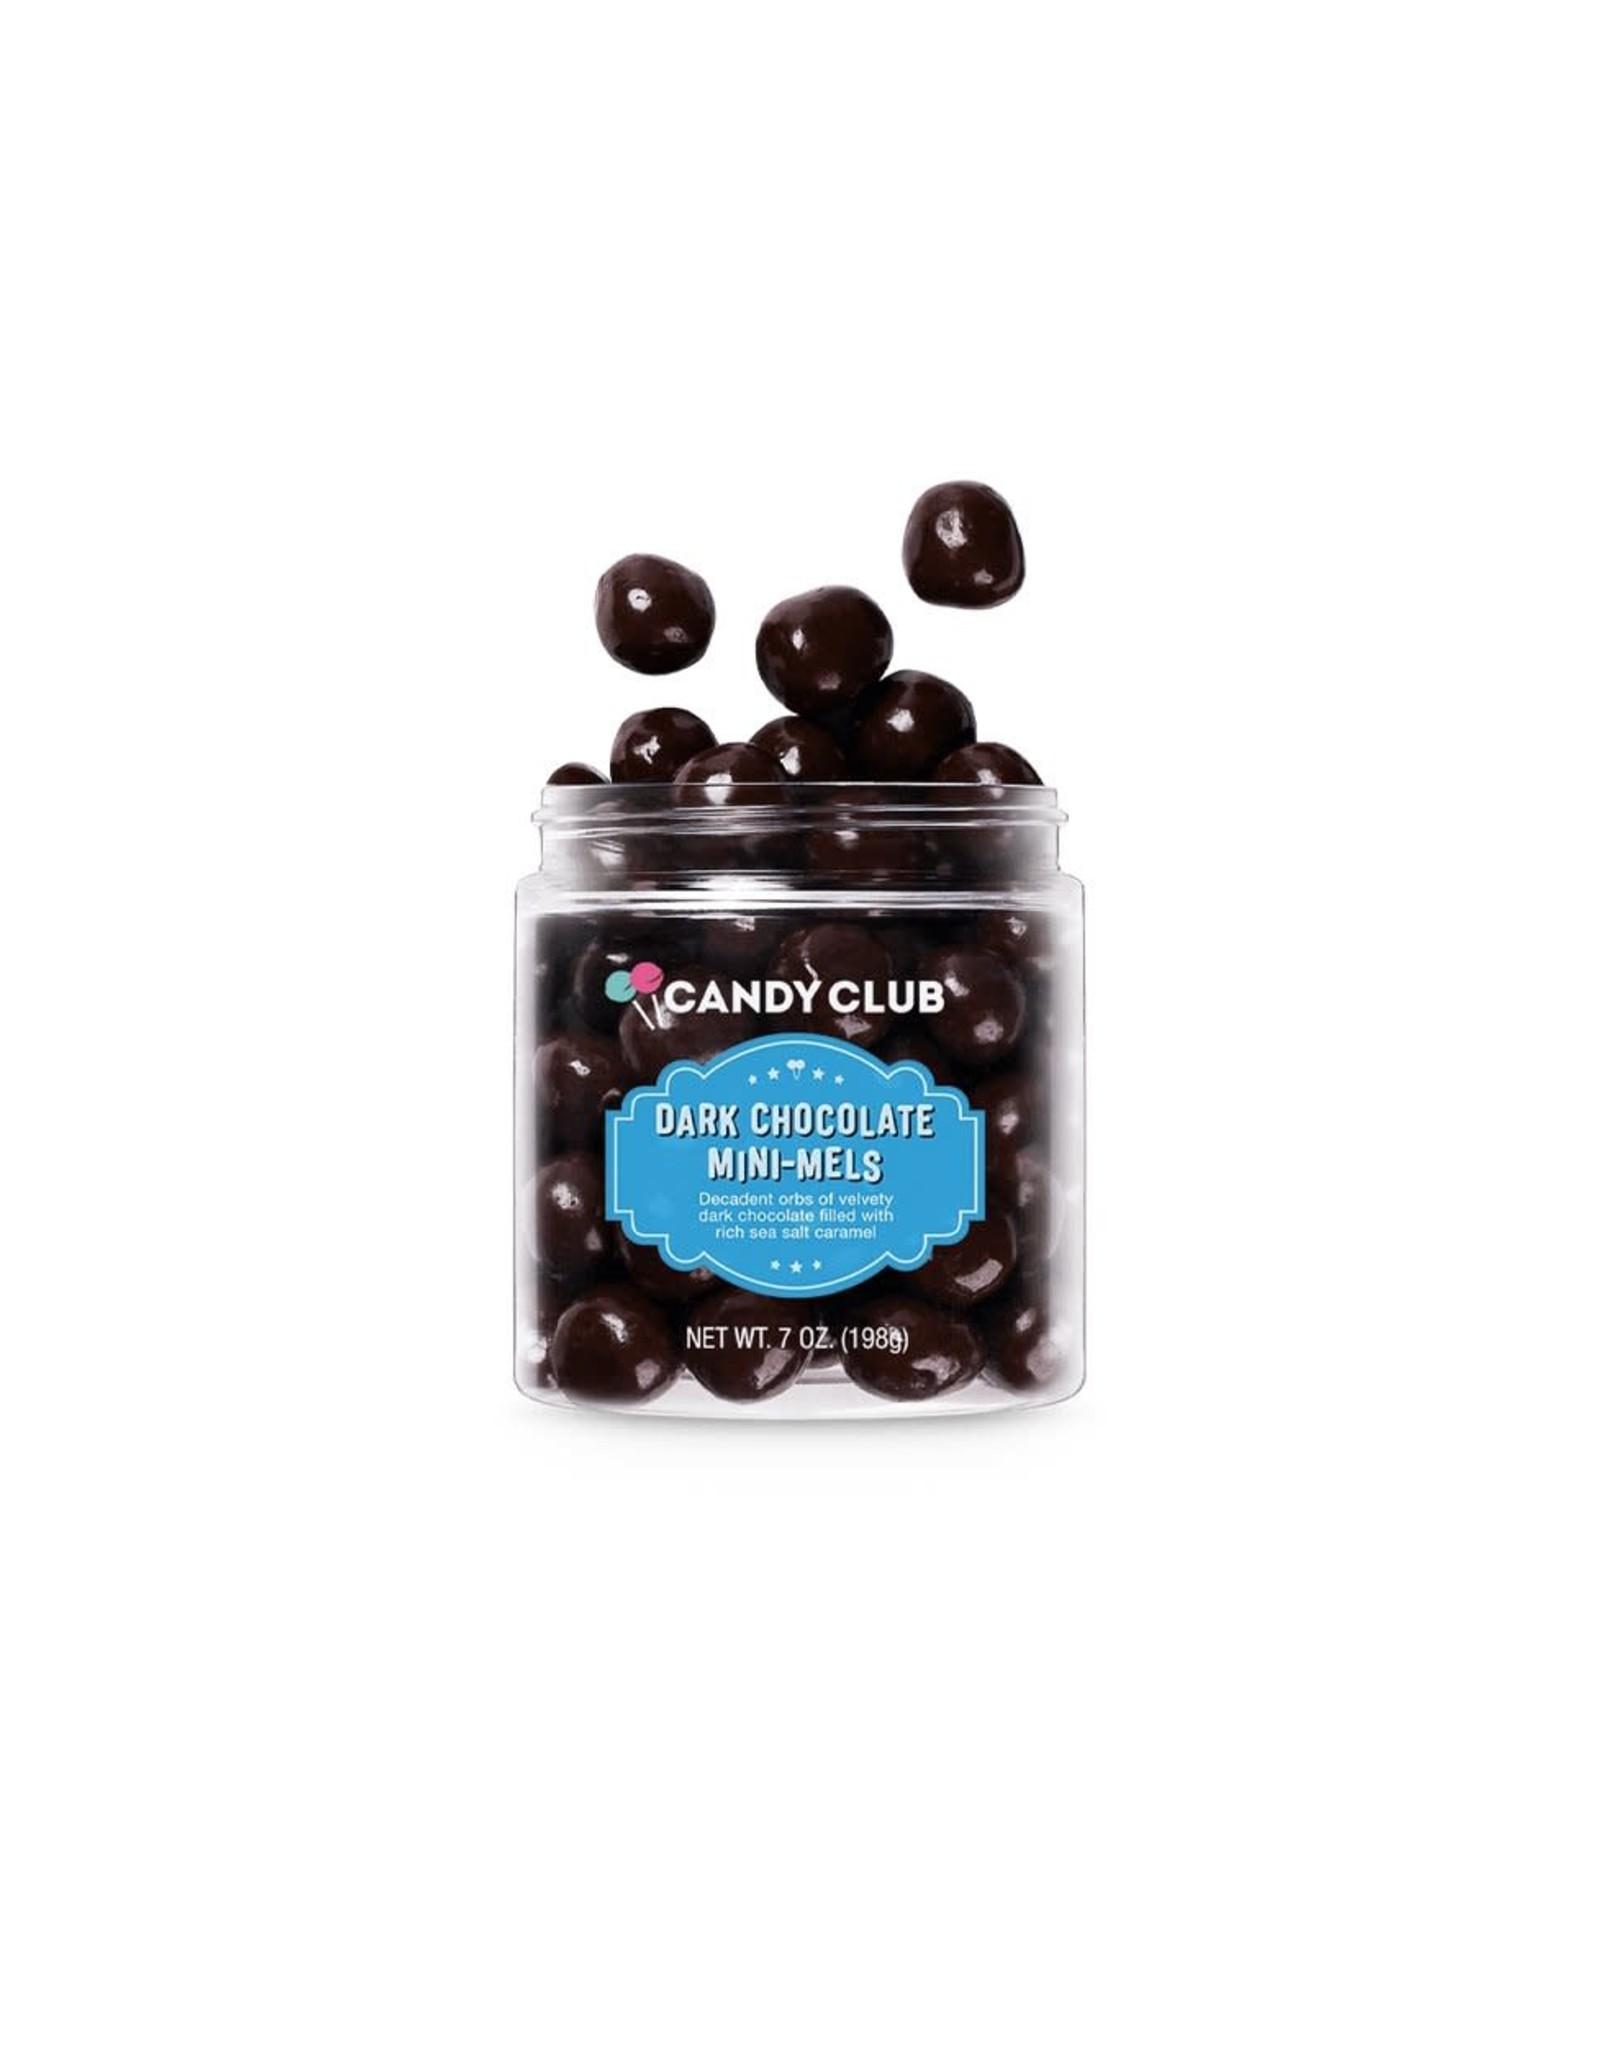 Candy Club Dark Chocolate Mini-Mels